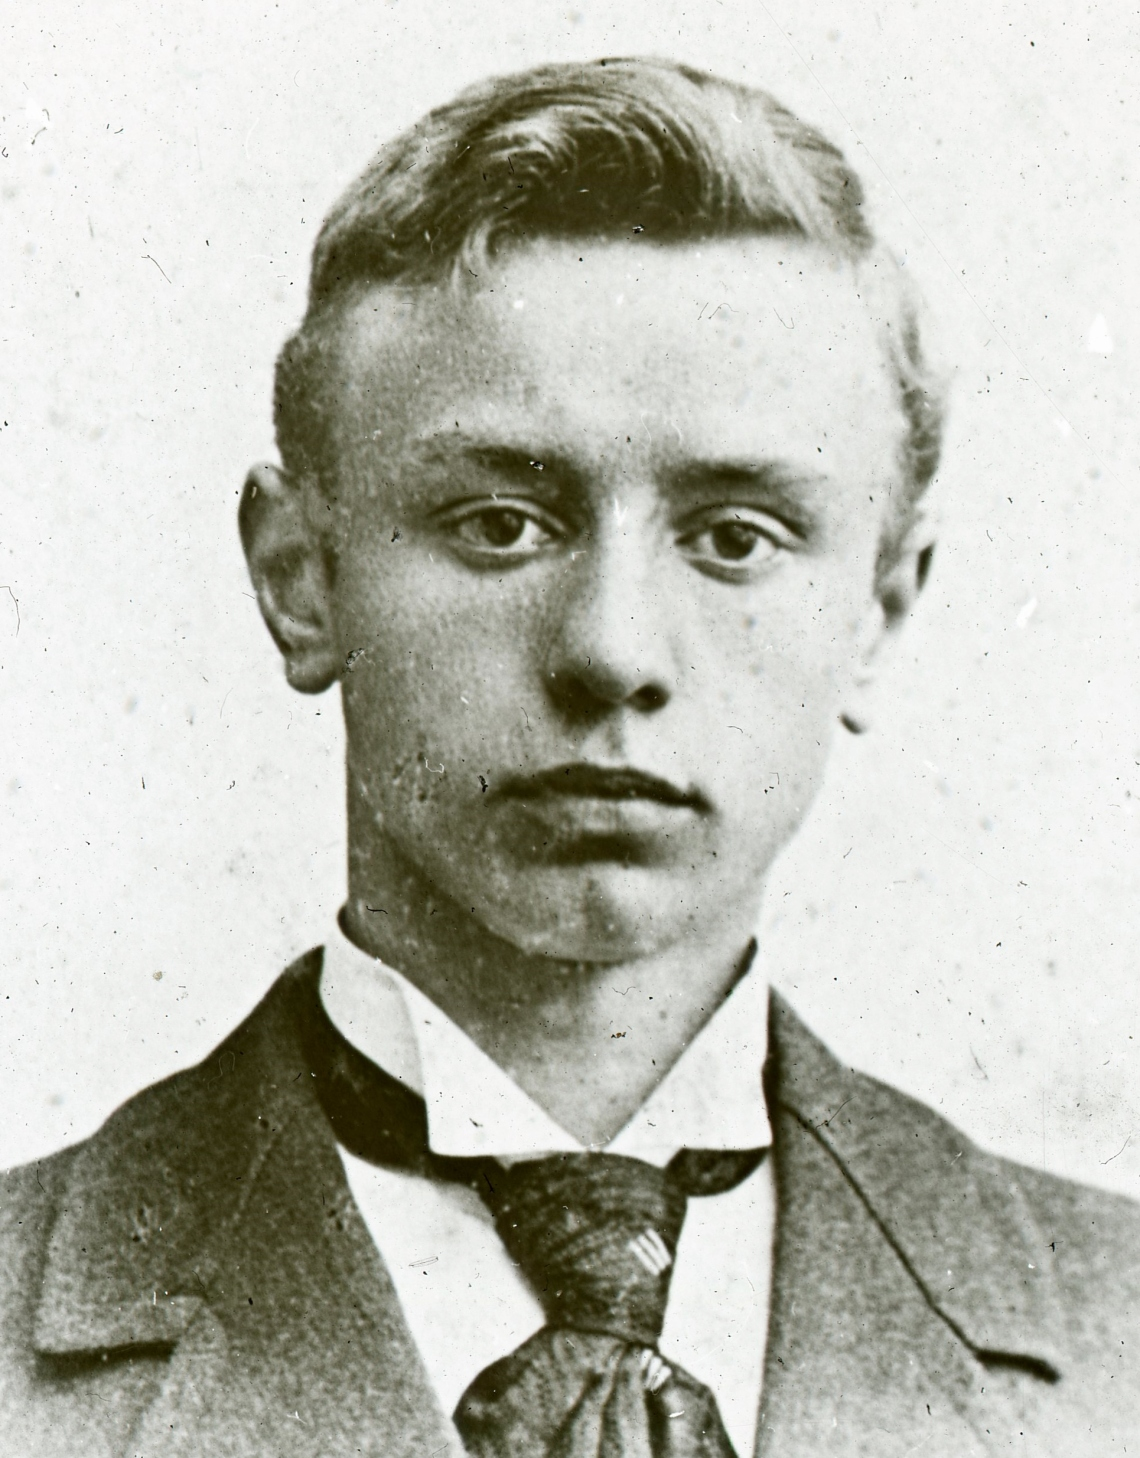 17. jeugdportre v.d. rector.